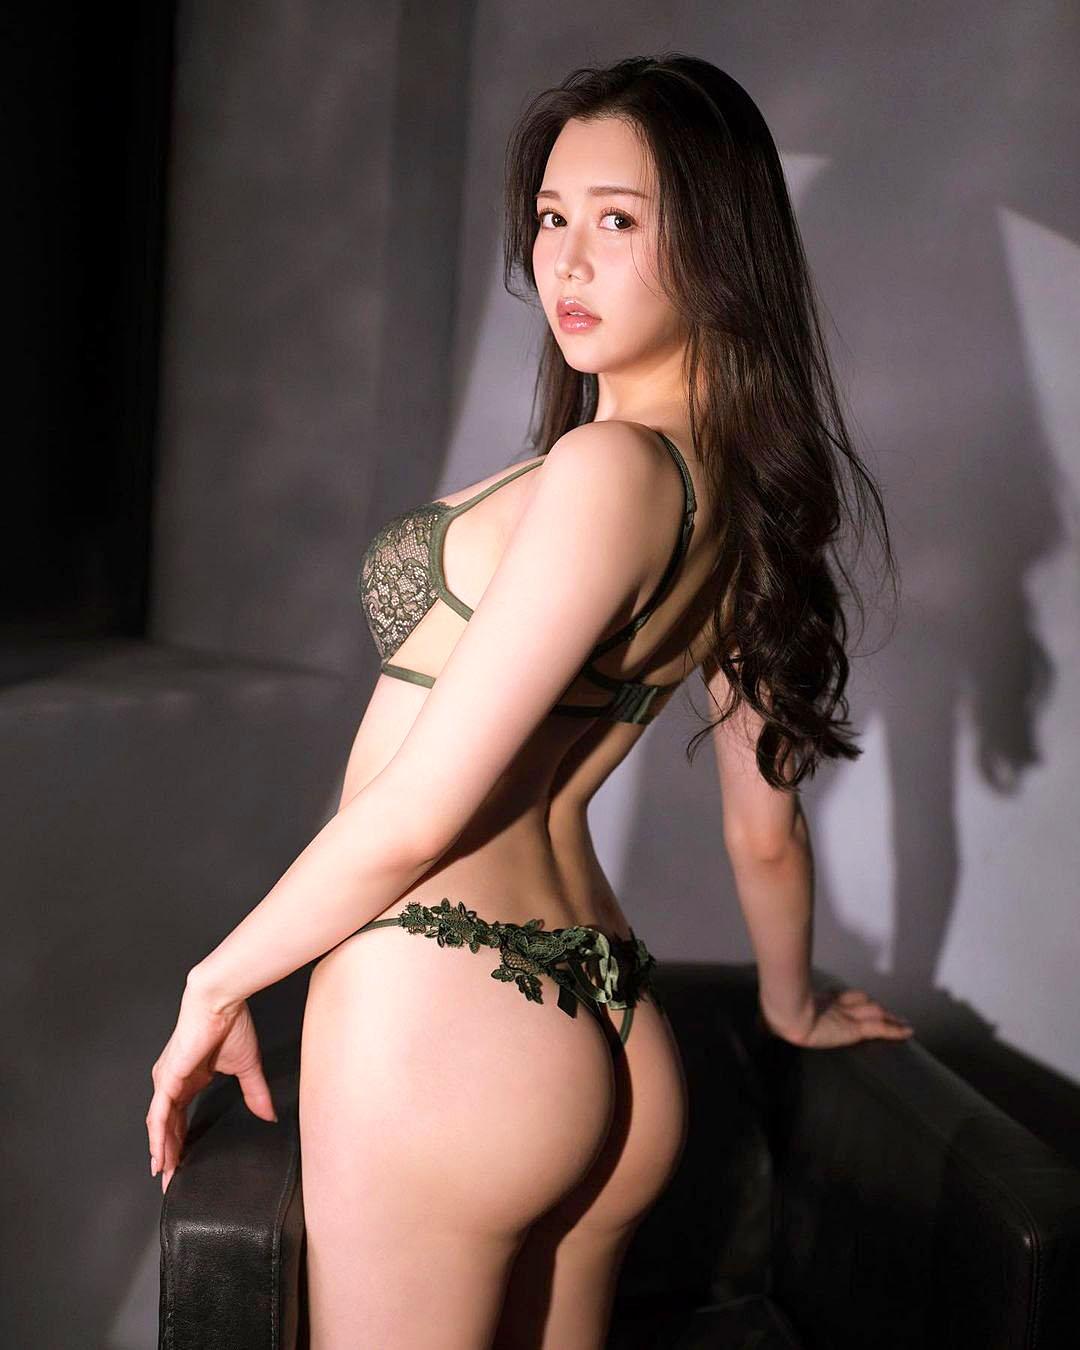 Miu Shiramine 2103 23.jpg